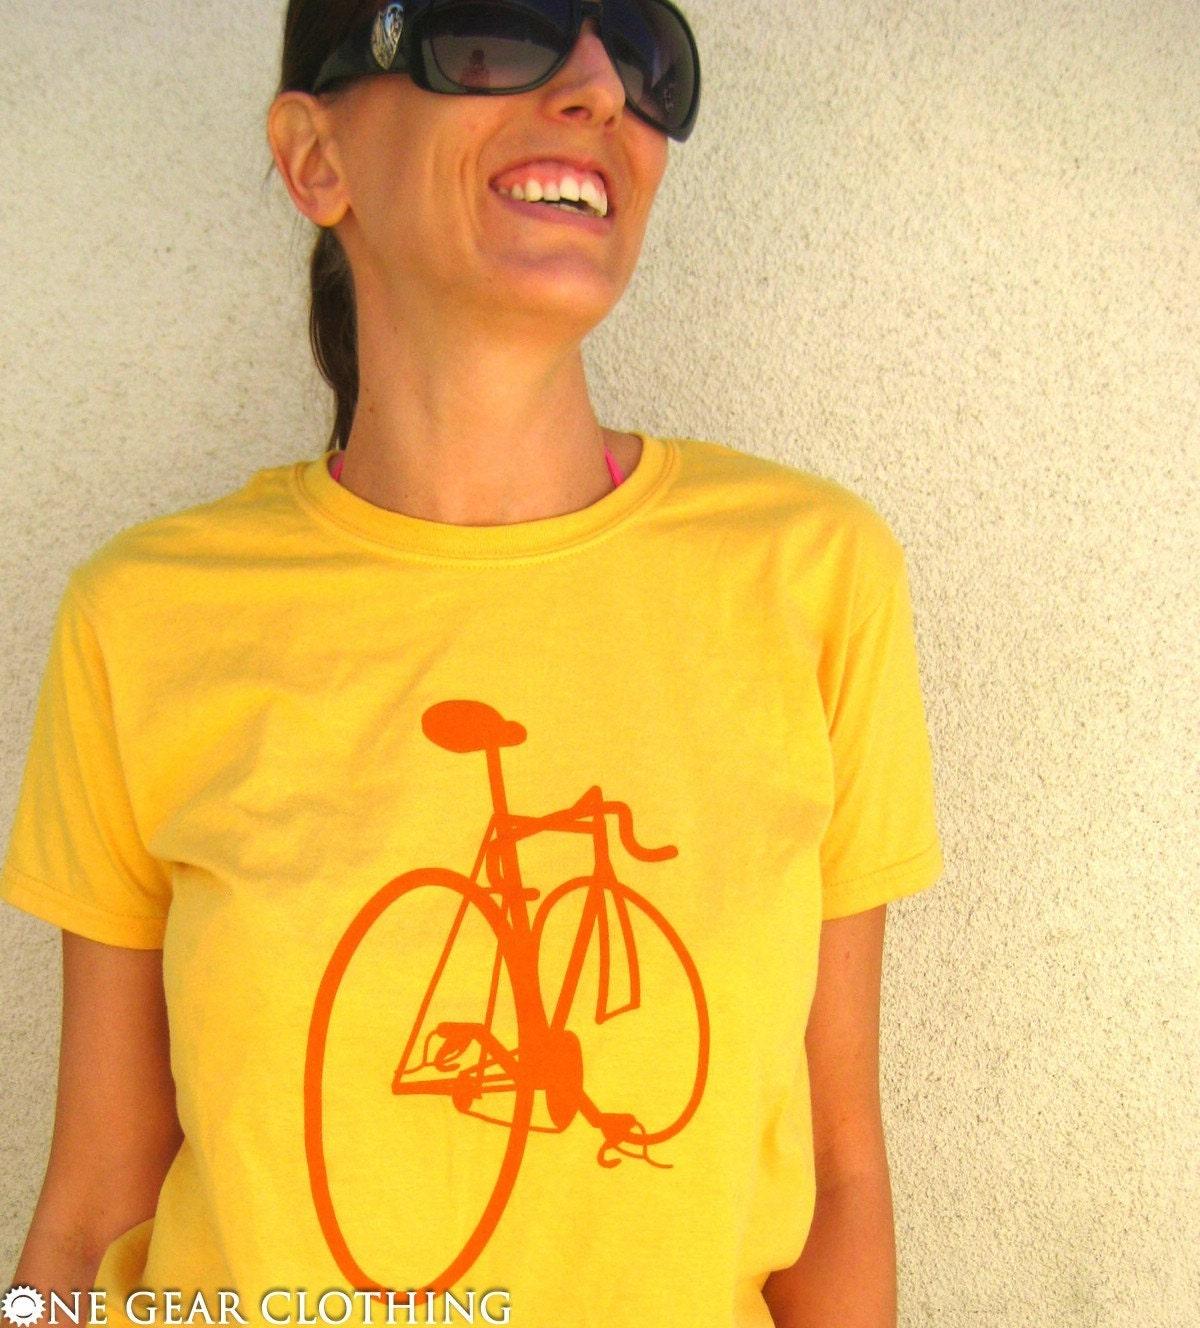 Bike's Got Back - Bicycle tee shirt - Orange on Yellow - Mens / Unisex XL